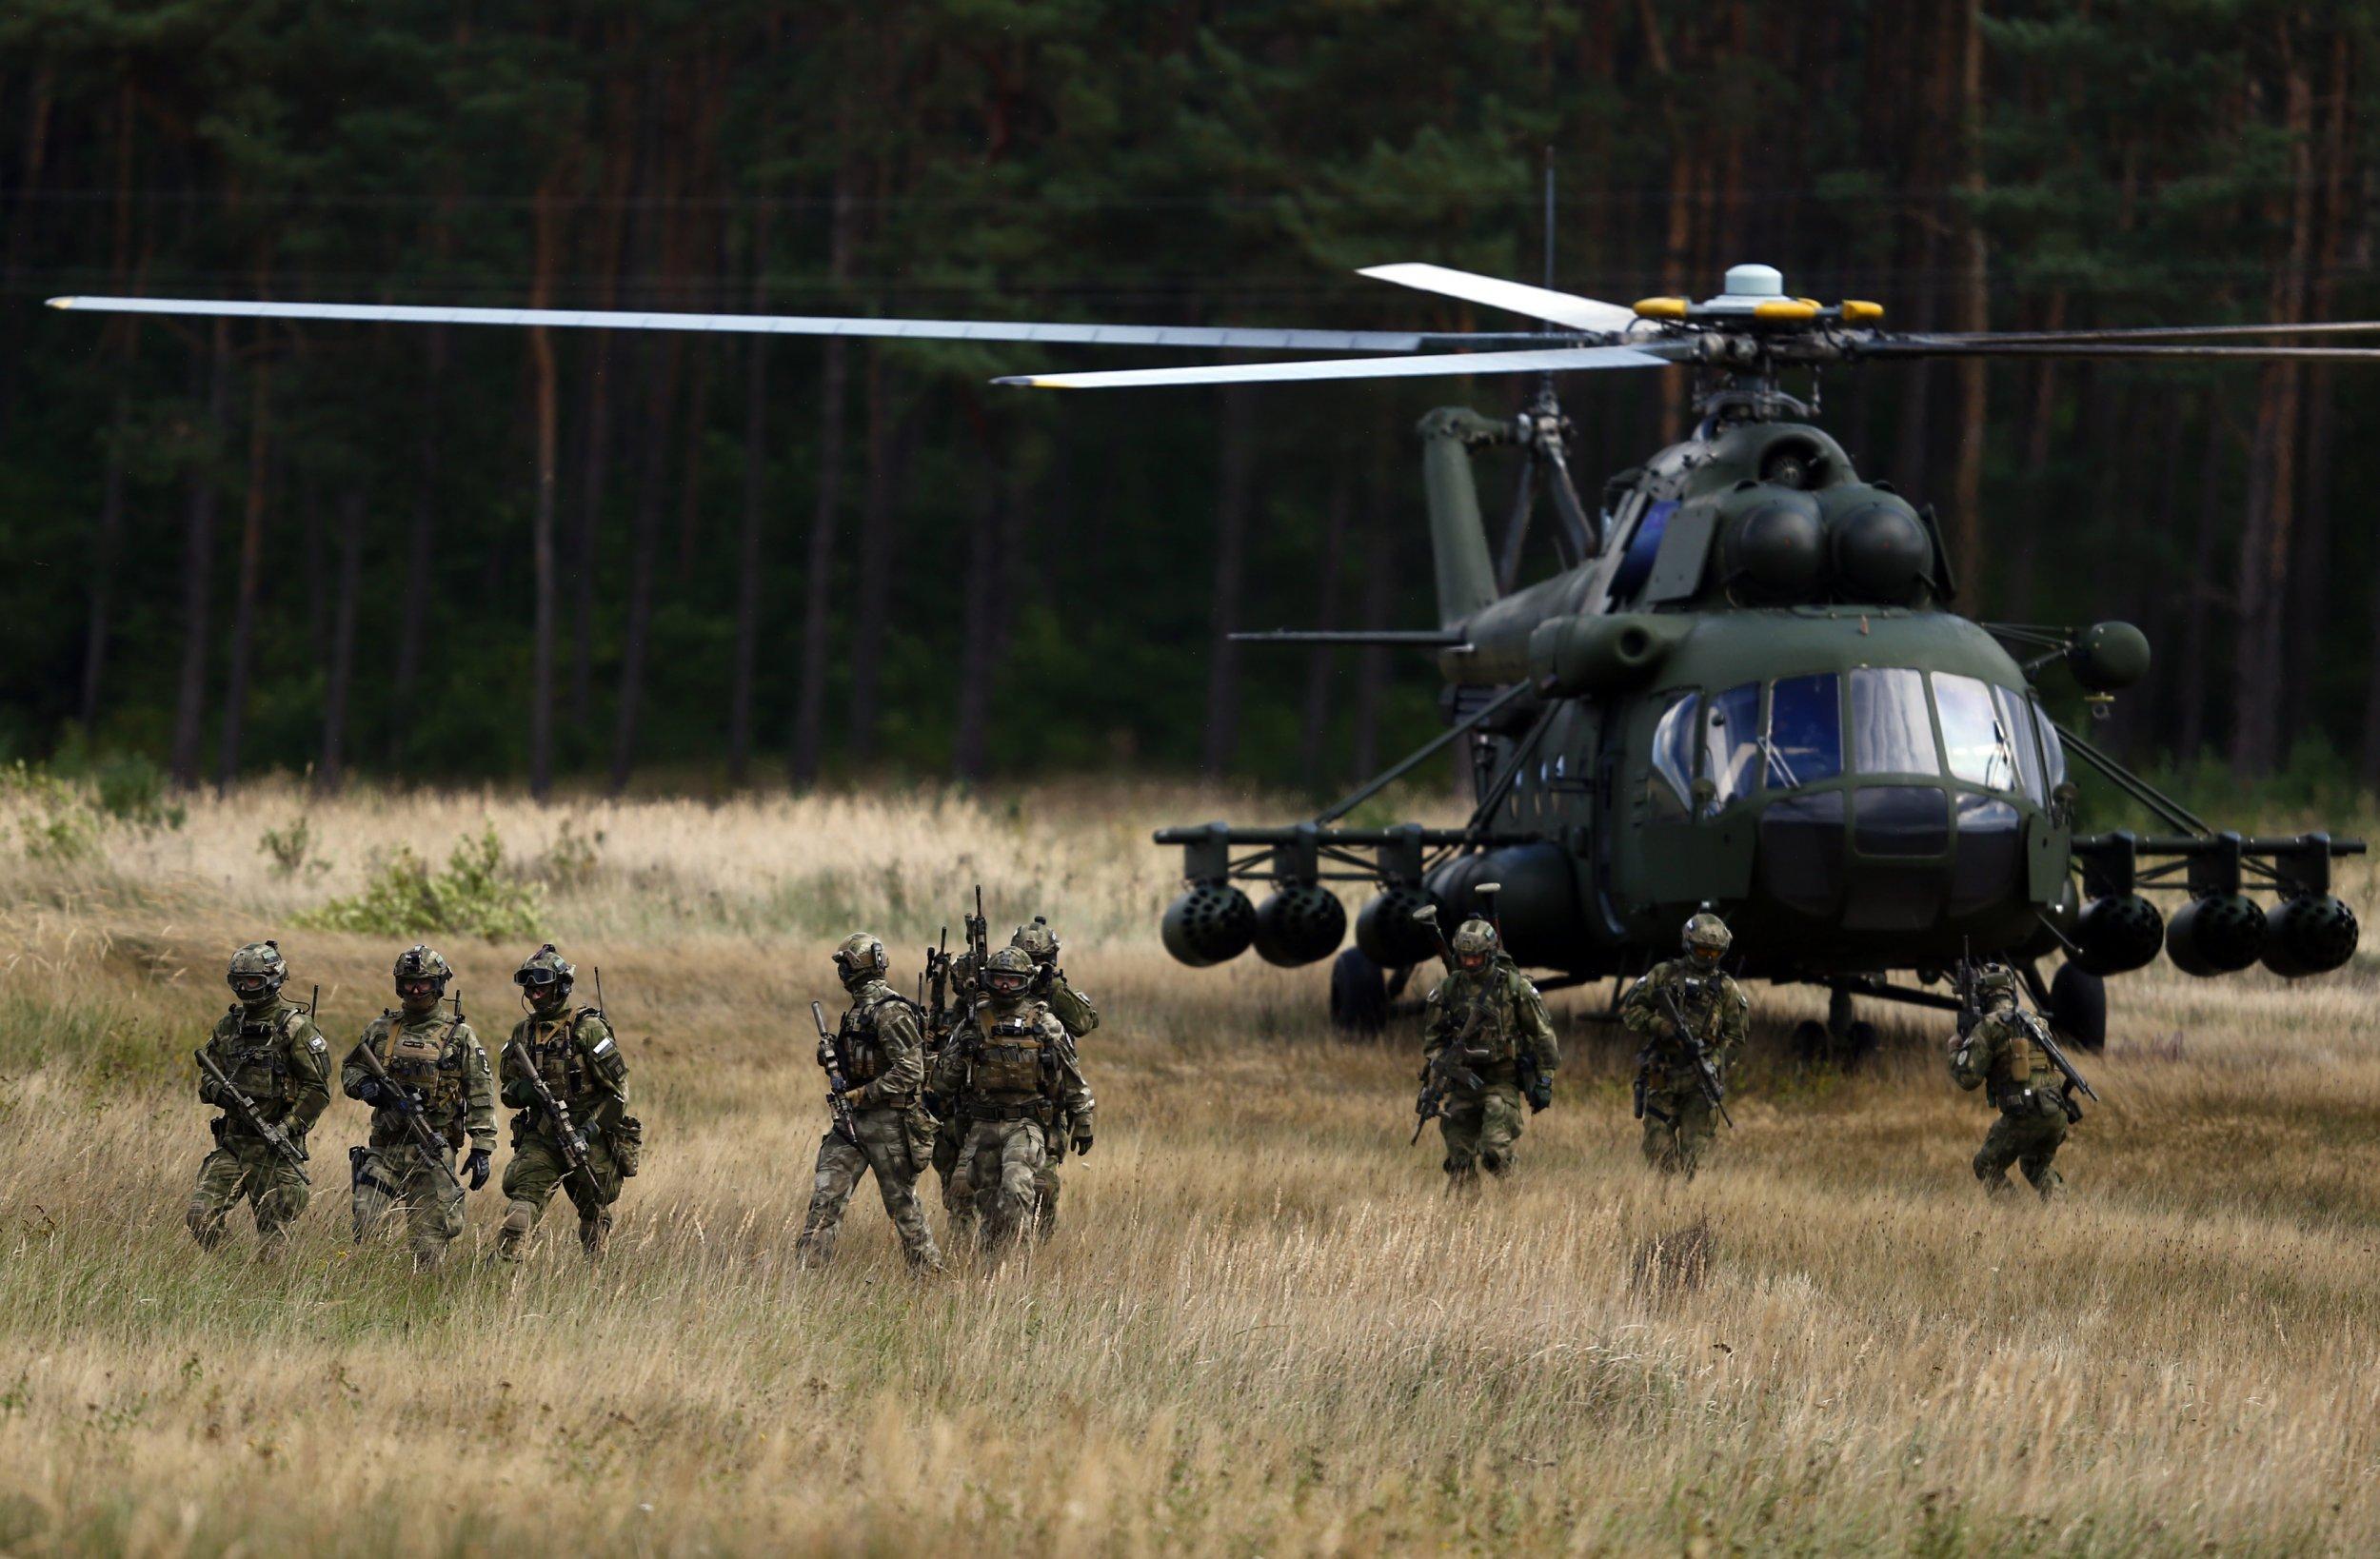 Mi-17 helicopter and Polish commandos